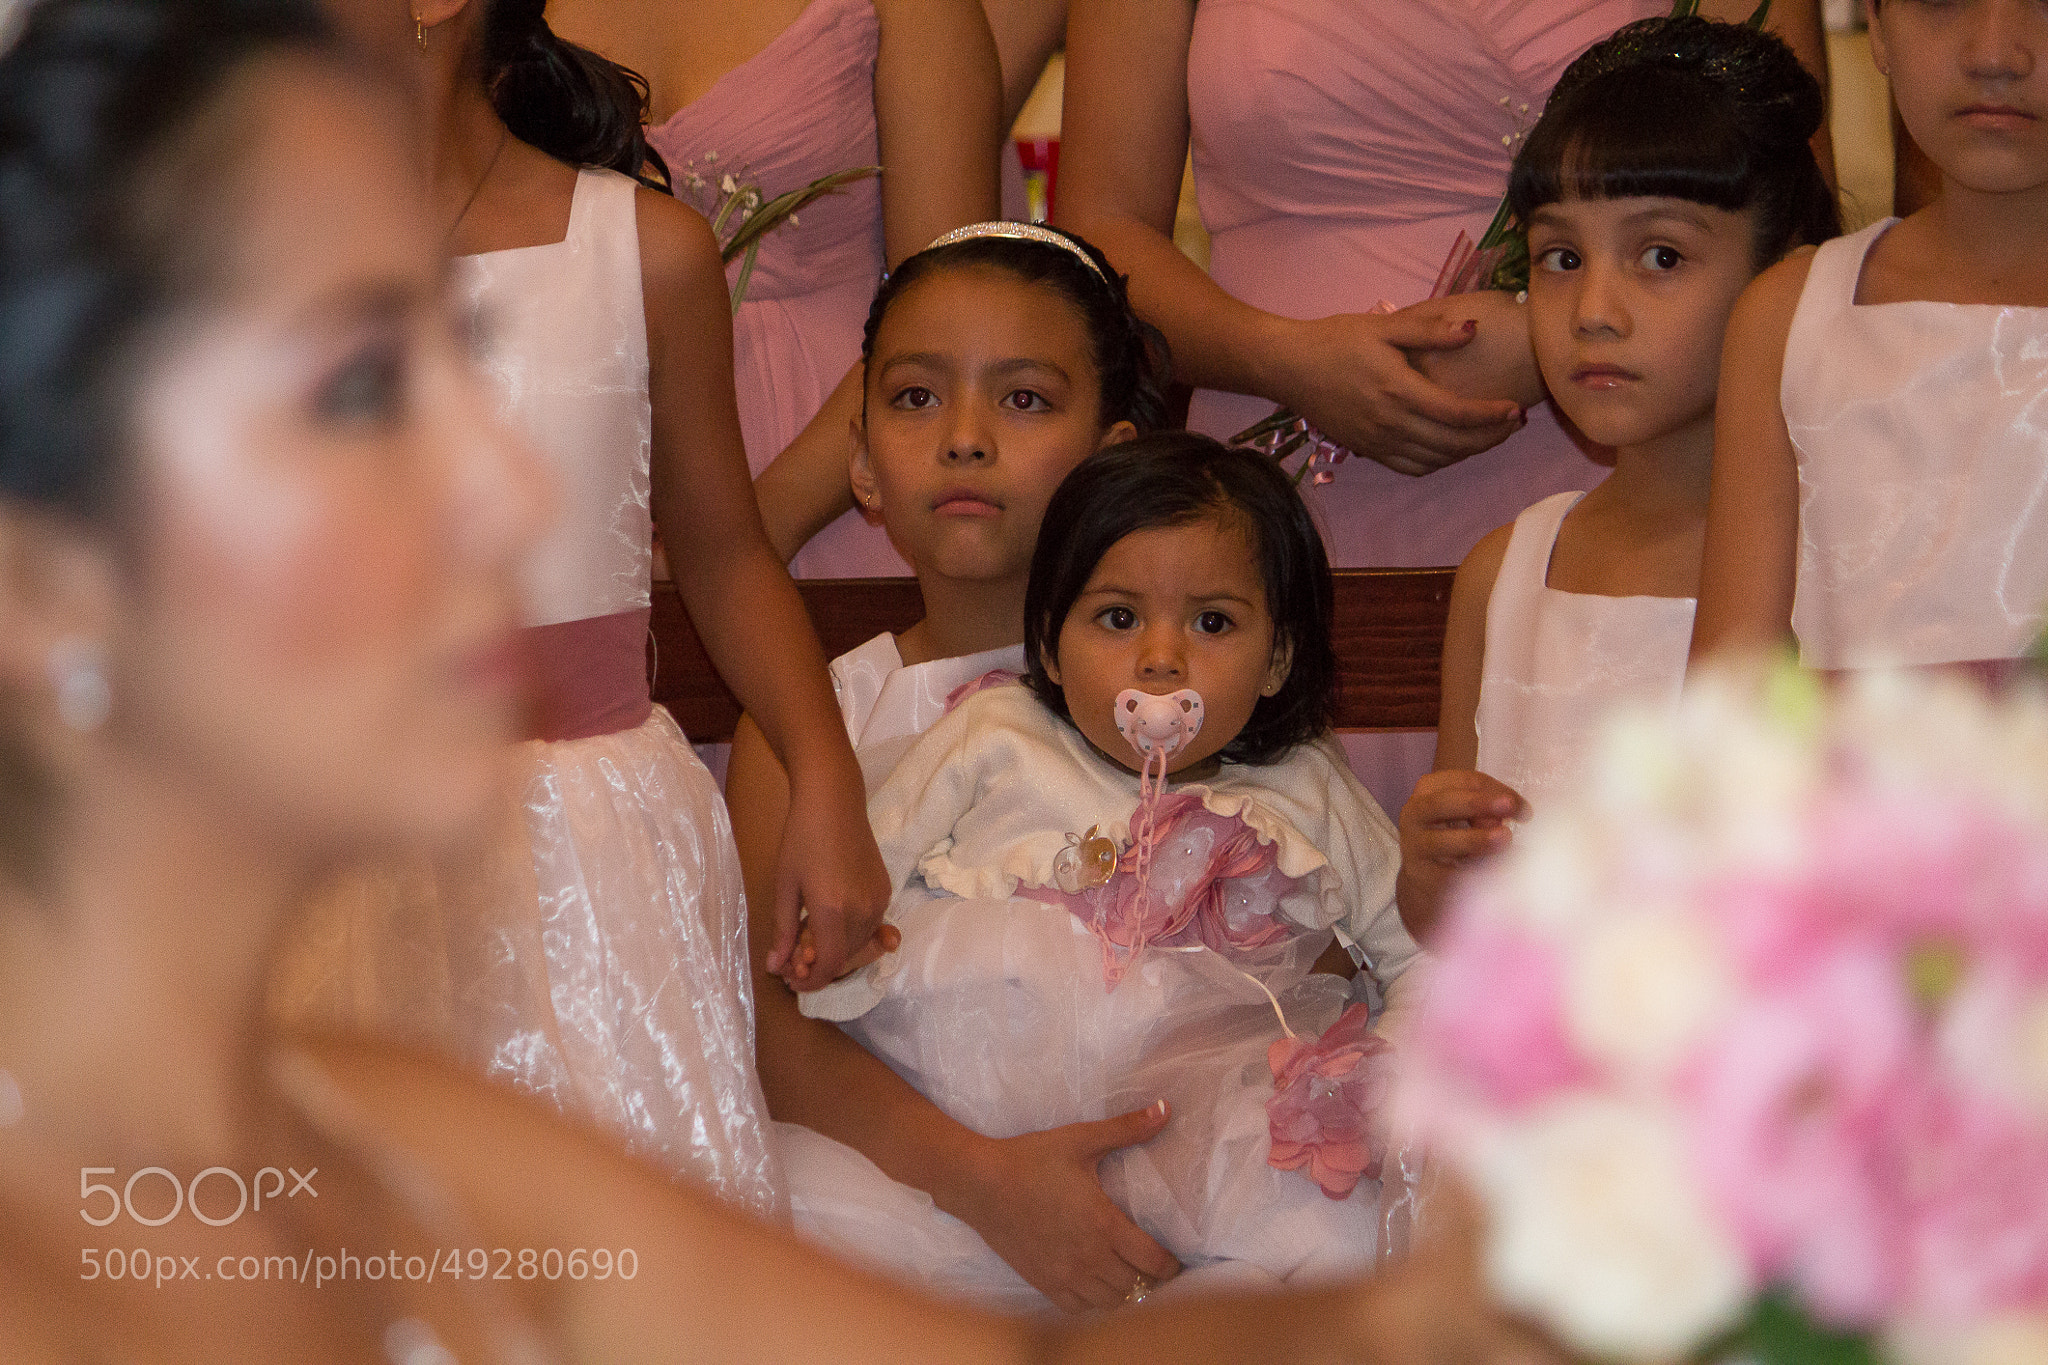 Photograph Untitled by Cristobal Garciaferro Rubio on 500px